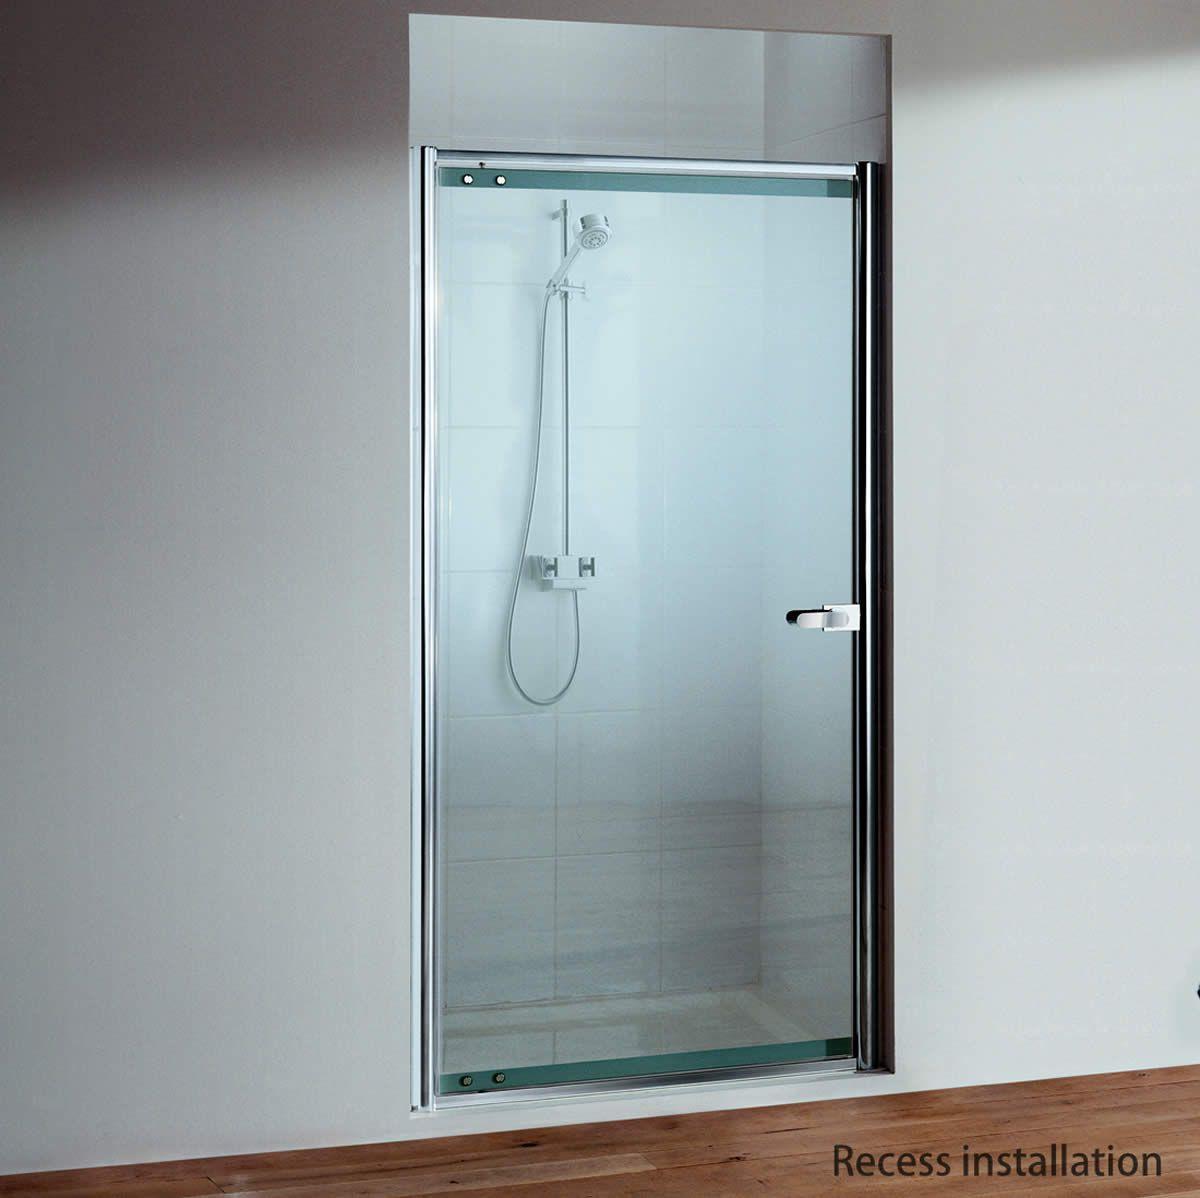 Allison Mcatee Nude matki shower screens uk lottery